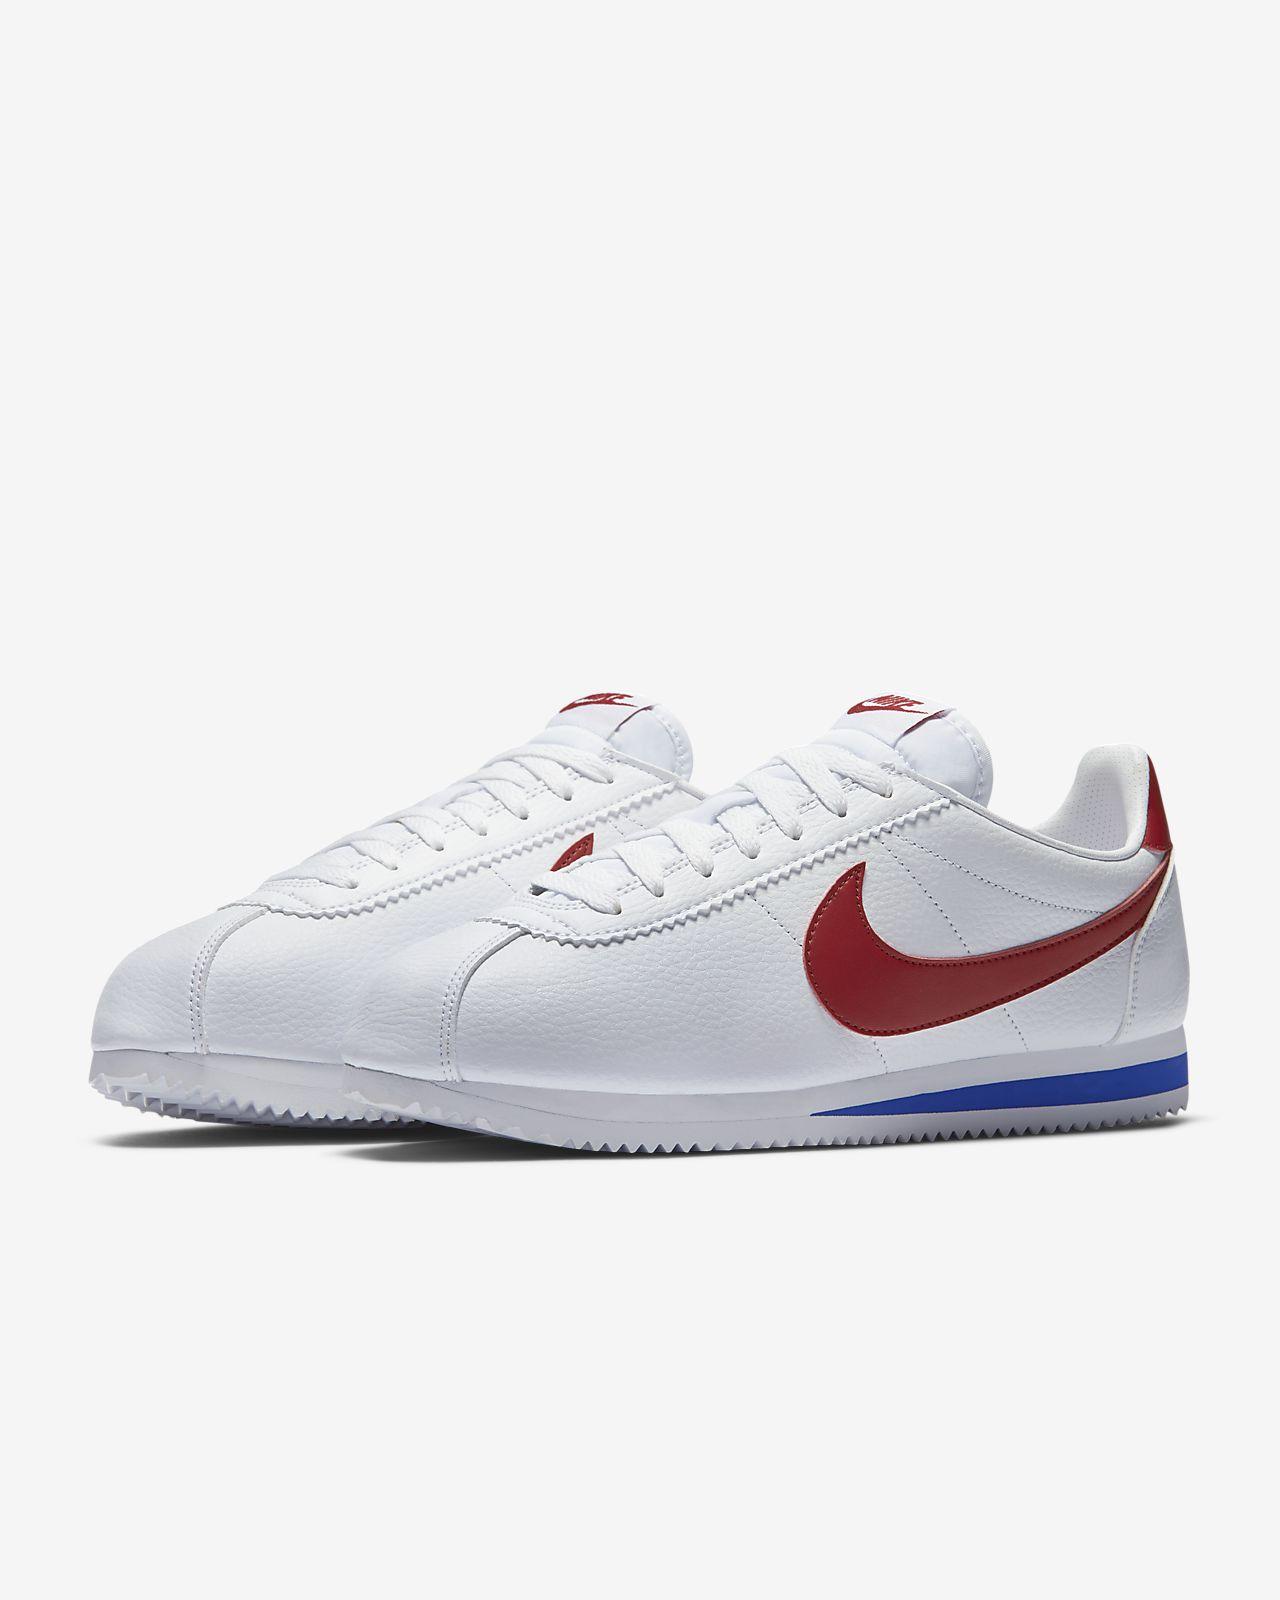 57457de4 Low Resolution Мужские кроссовки Nike Classic Cortez Мужские кроссовки Nike  Classic Cortez